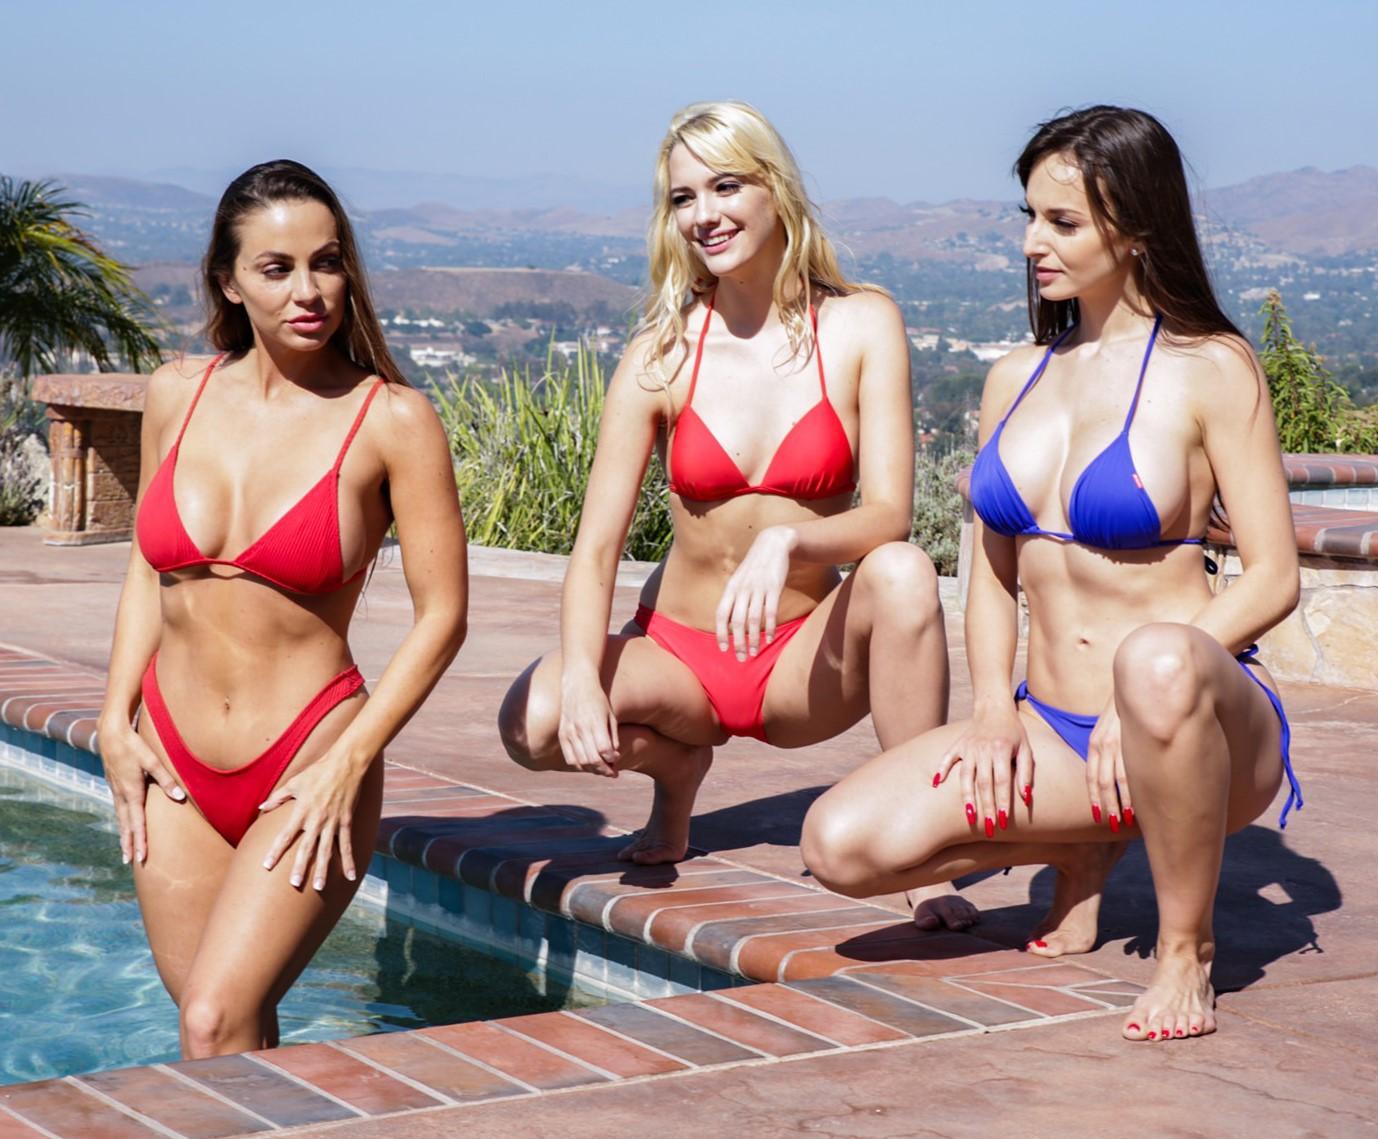 Abigail Mac, Kenna James, Lexi Luna - Instructor HD 720p